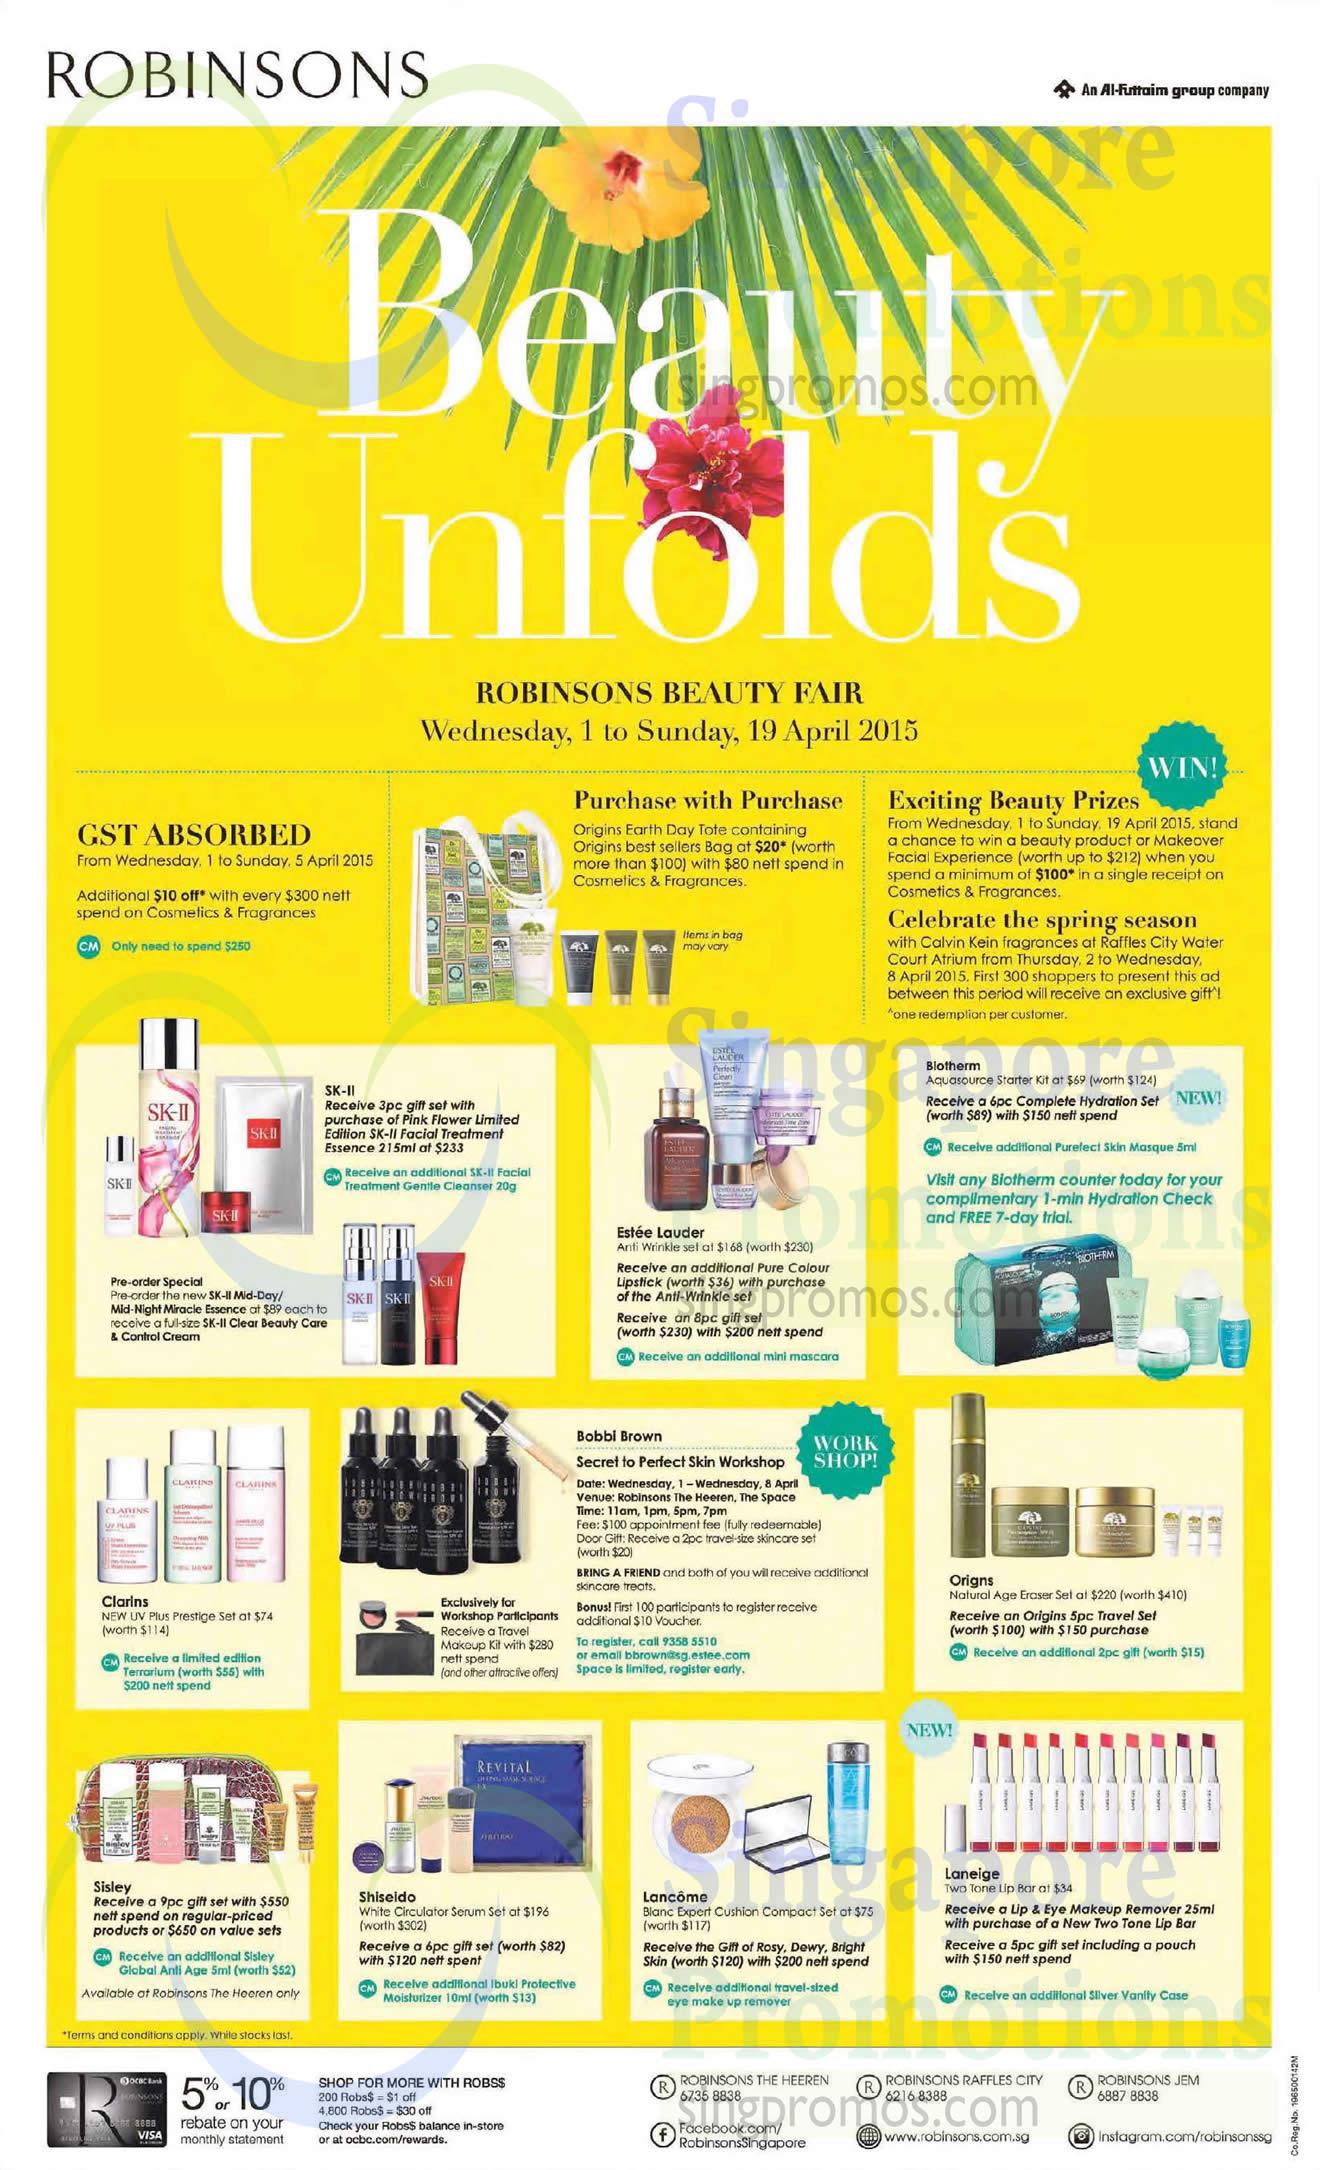 1 Apr Cosmetics, Clarins, Estee Lauder, Biotherm, SK II, Bobbi Brown, Lancome